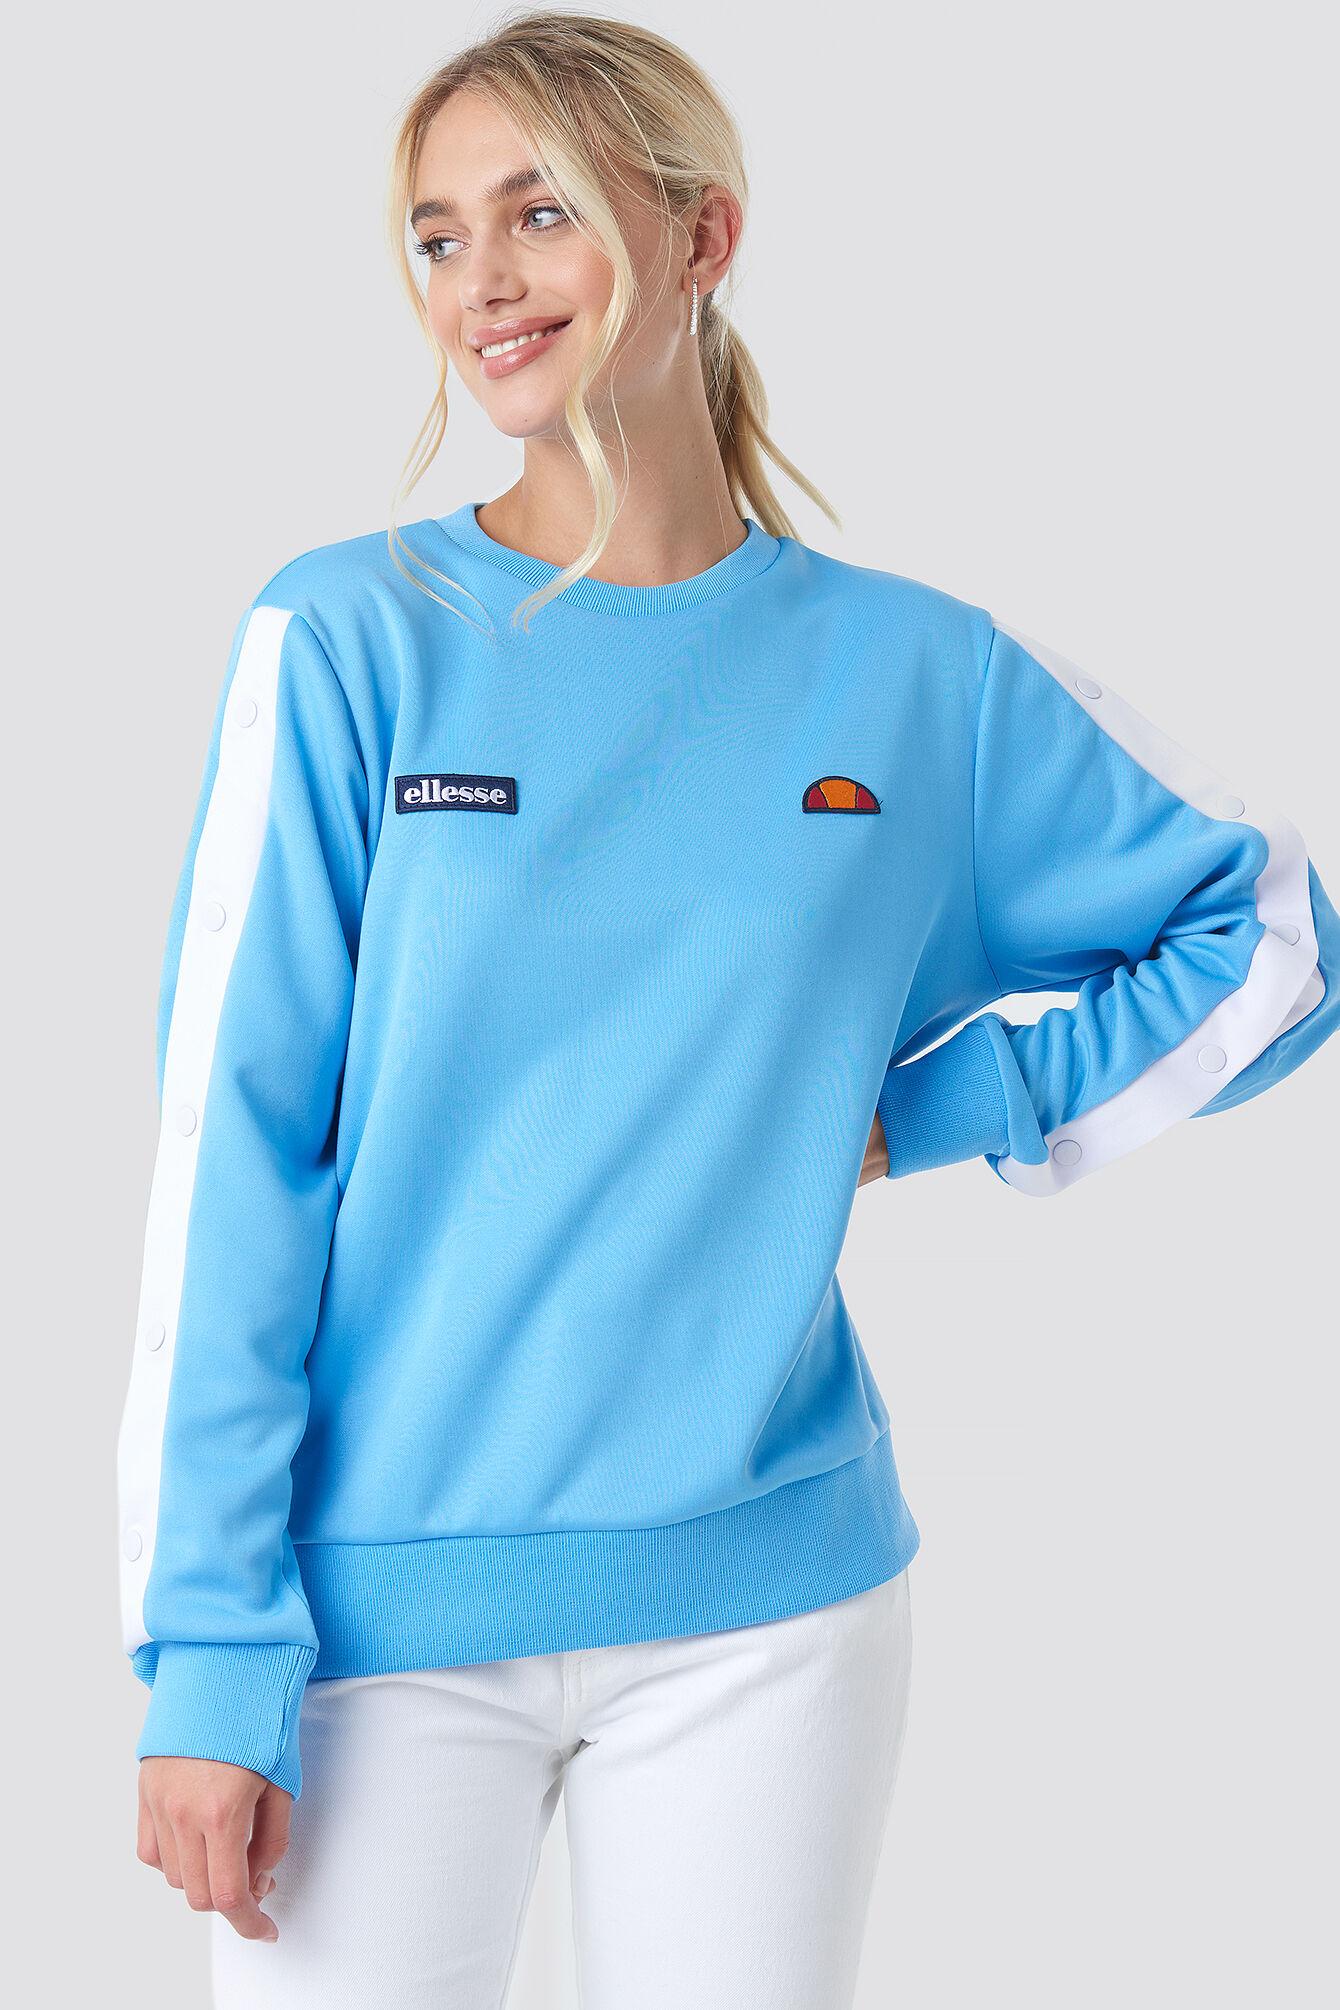 Ellesse El Abrianna Sweater - Blue